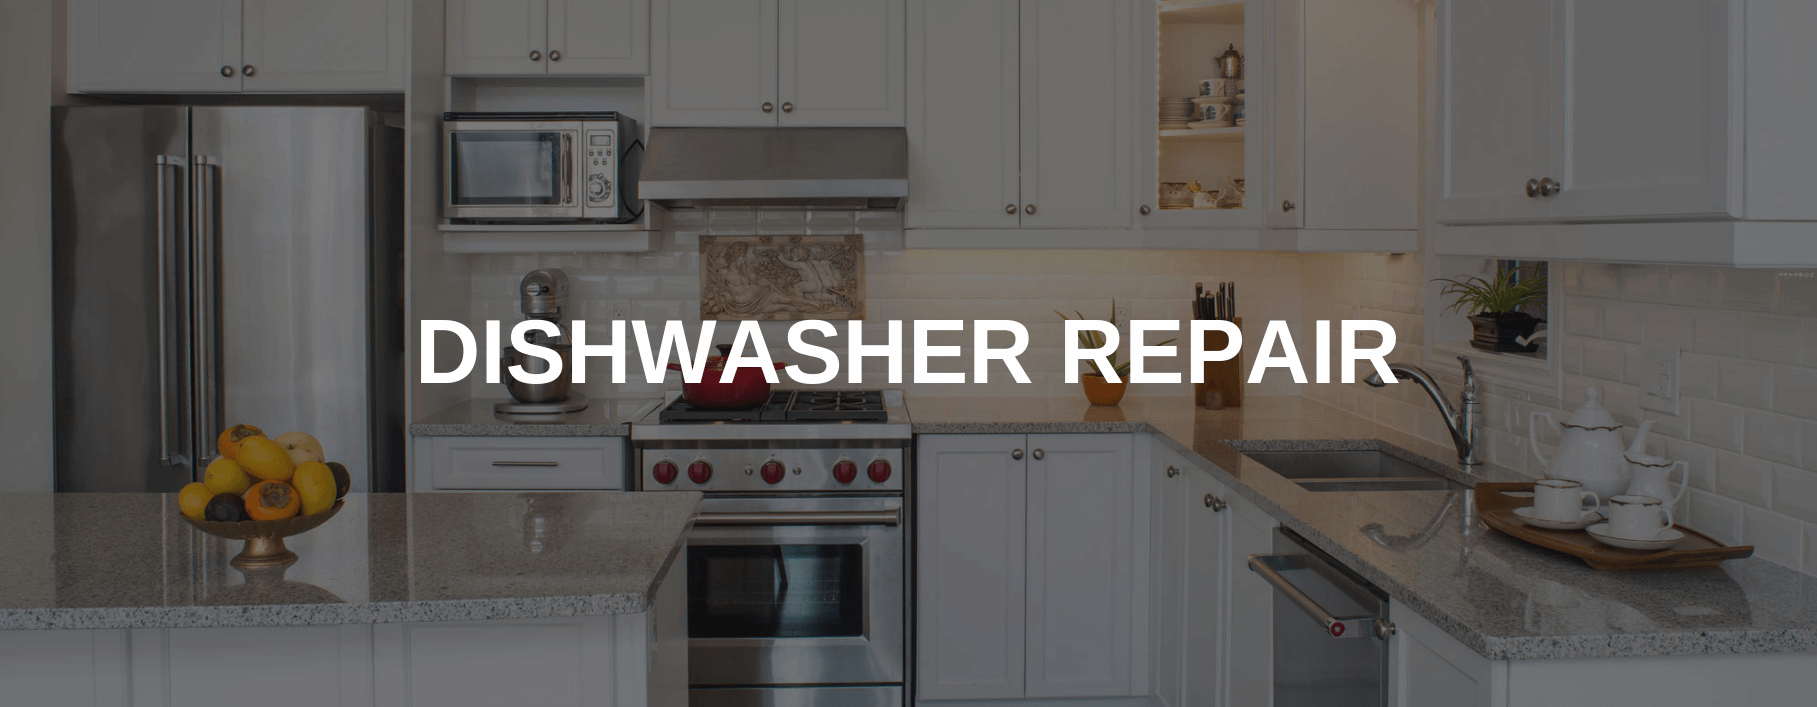 dishwasher repair city